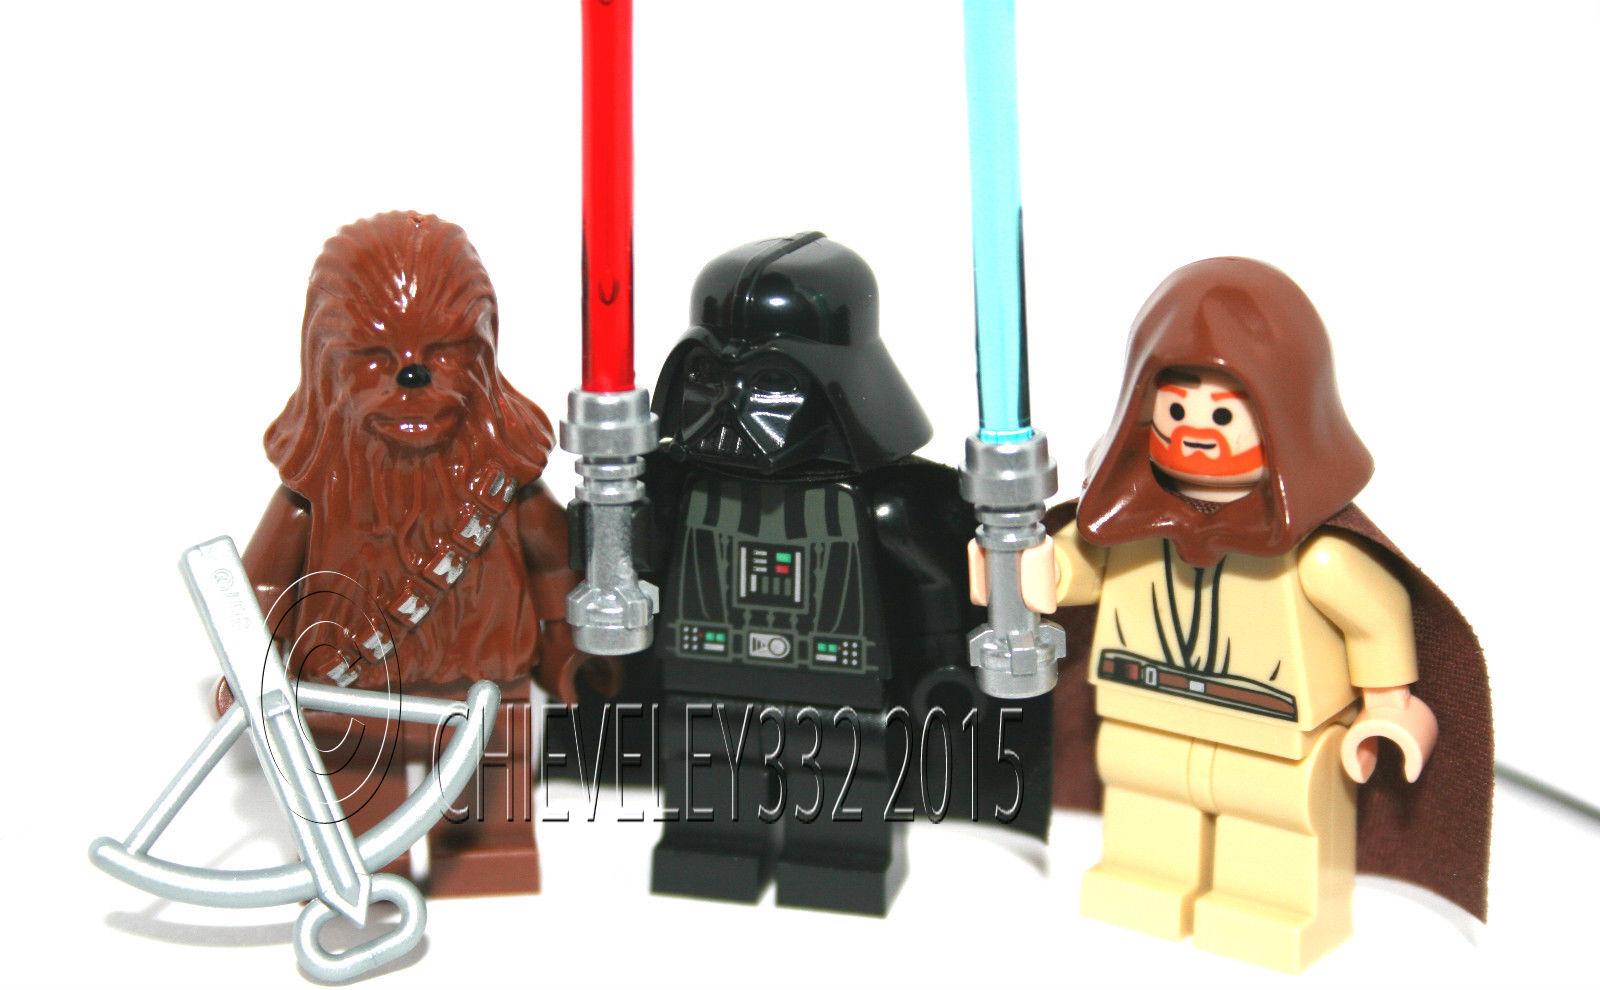 Lego Minifigures Chewbacca Darth Vader and Obi-Wan Kenobi Minifigures Brand New